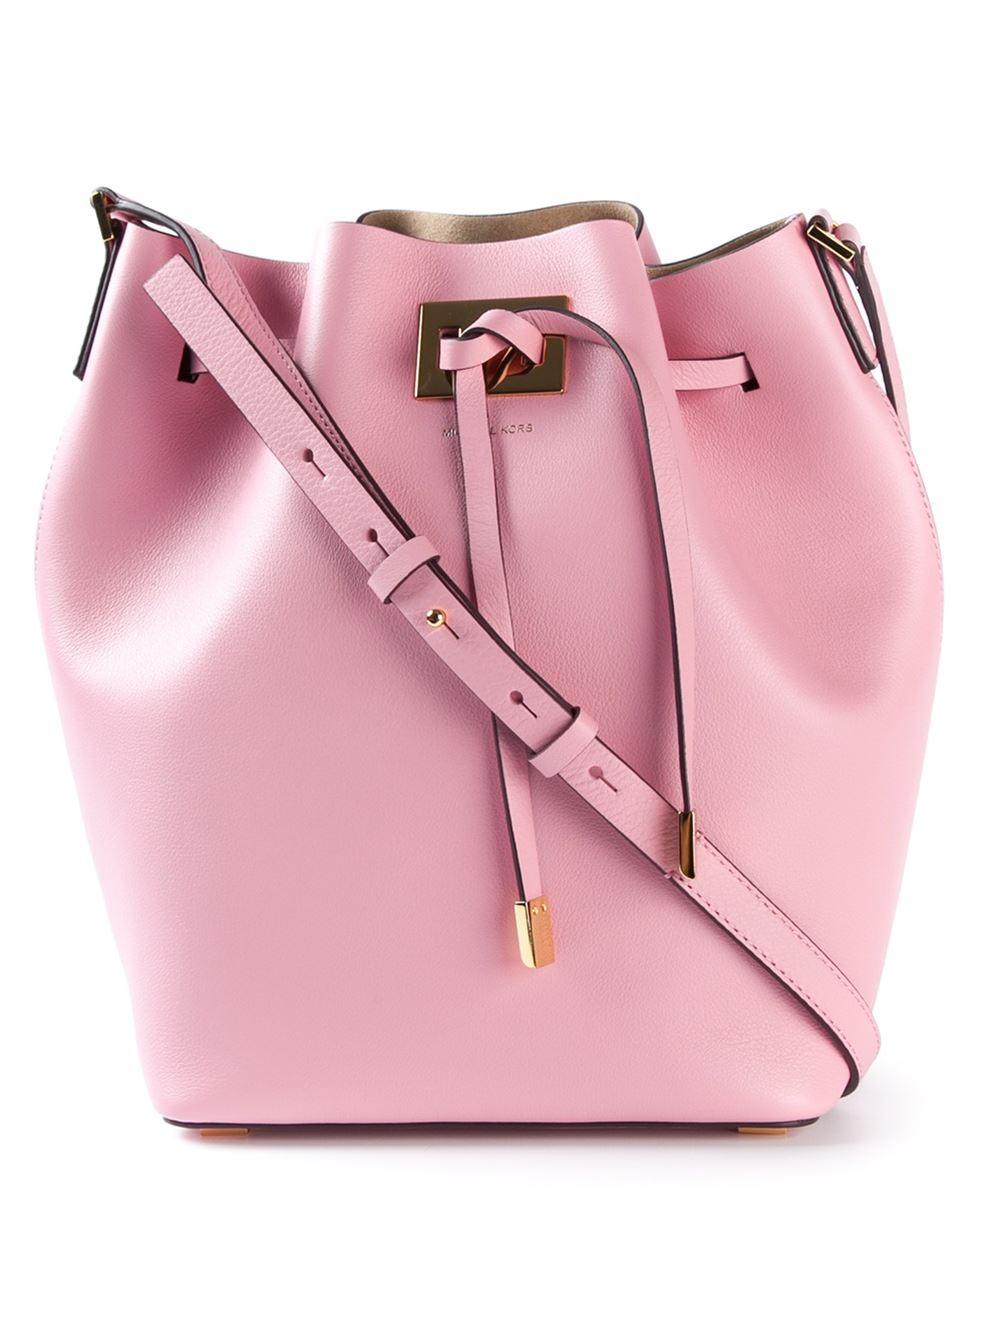 ca576850e546cf Michael Kors 'Miranda' Bucket Bag in Pink - Lyst